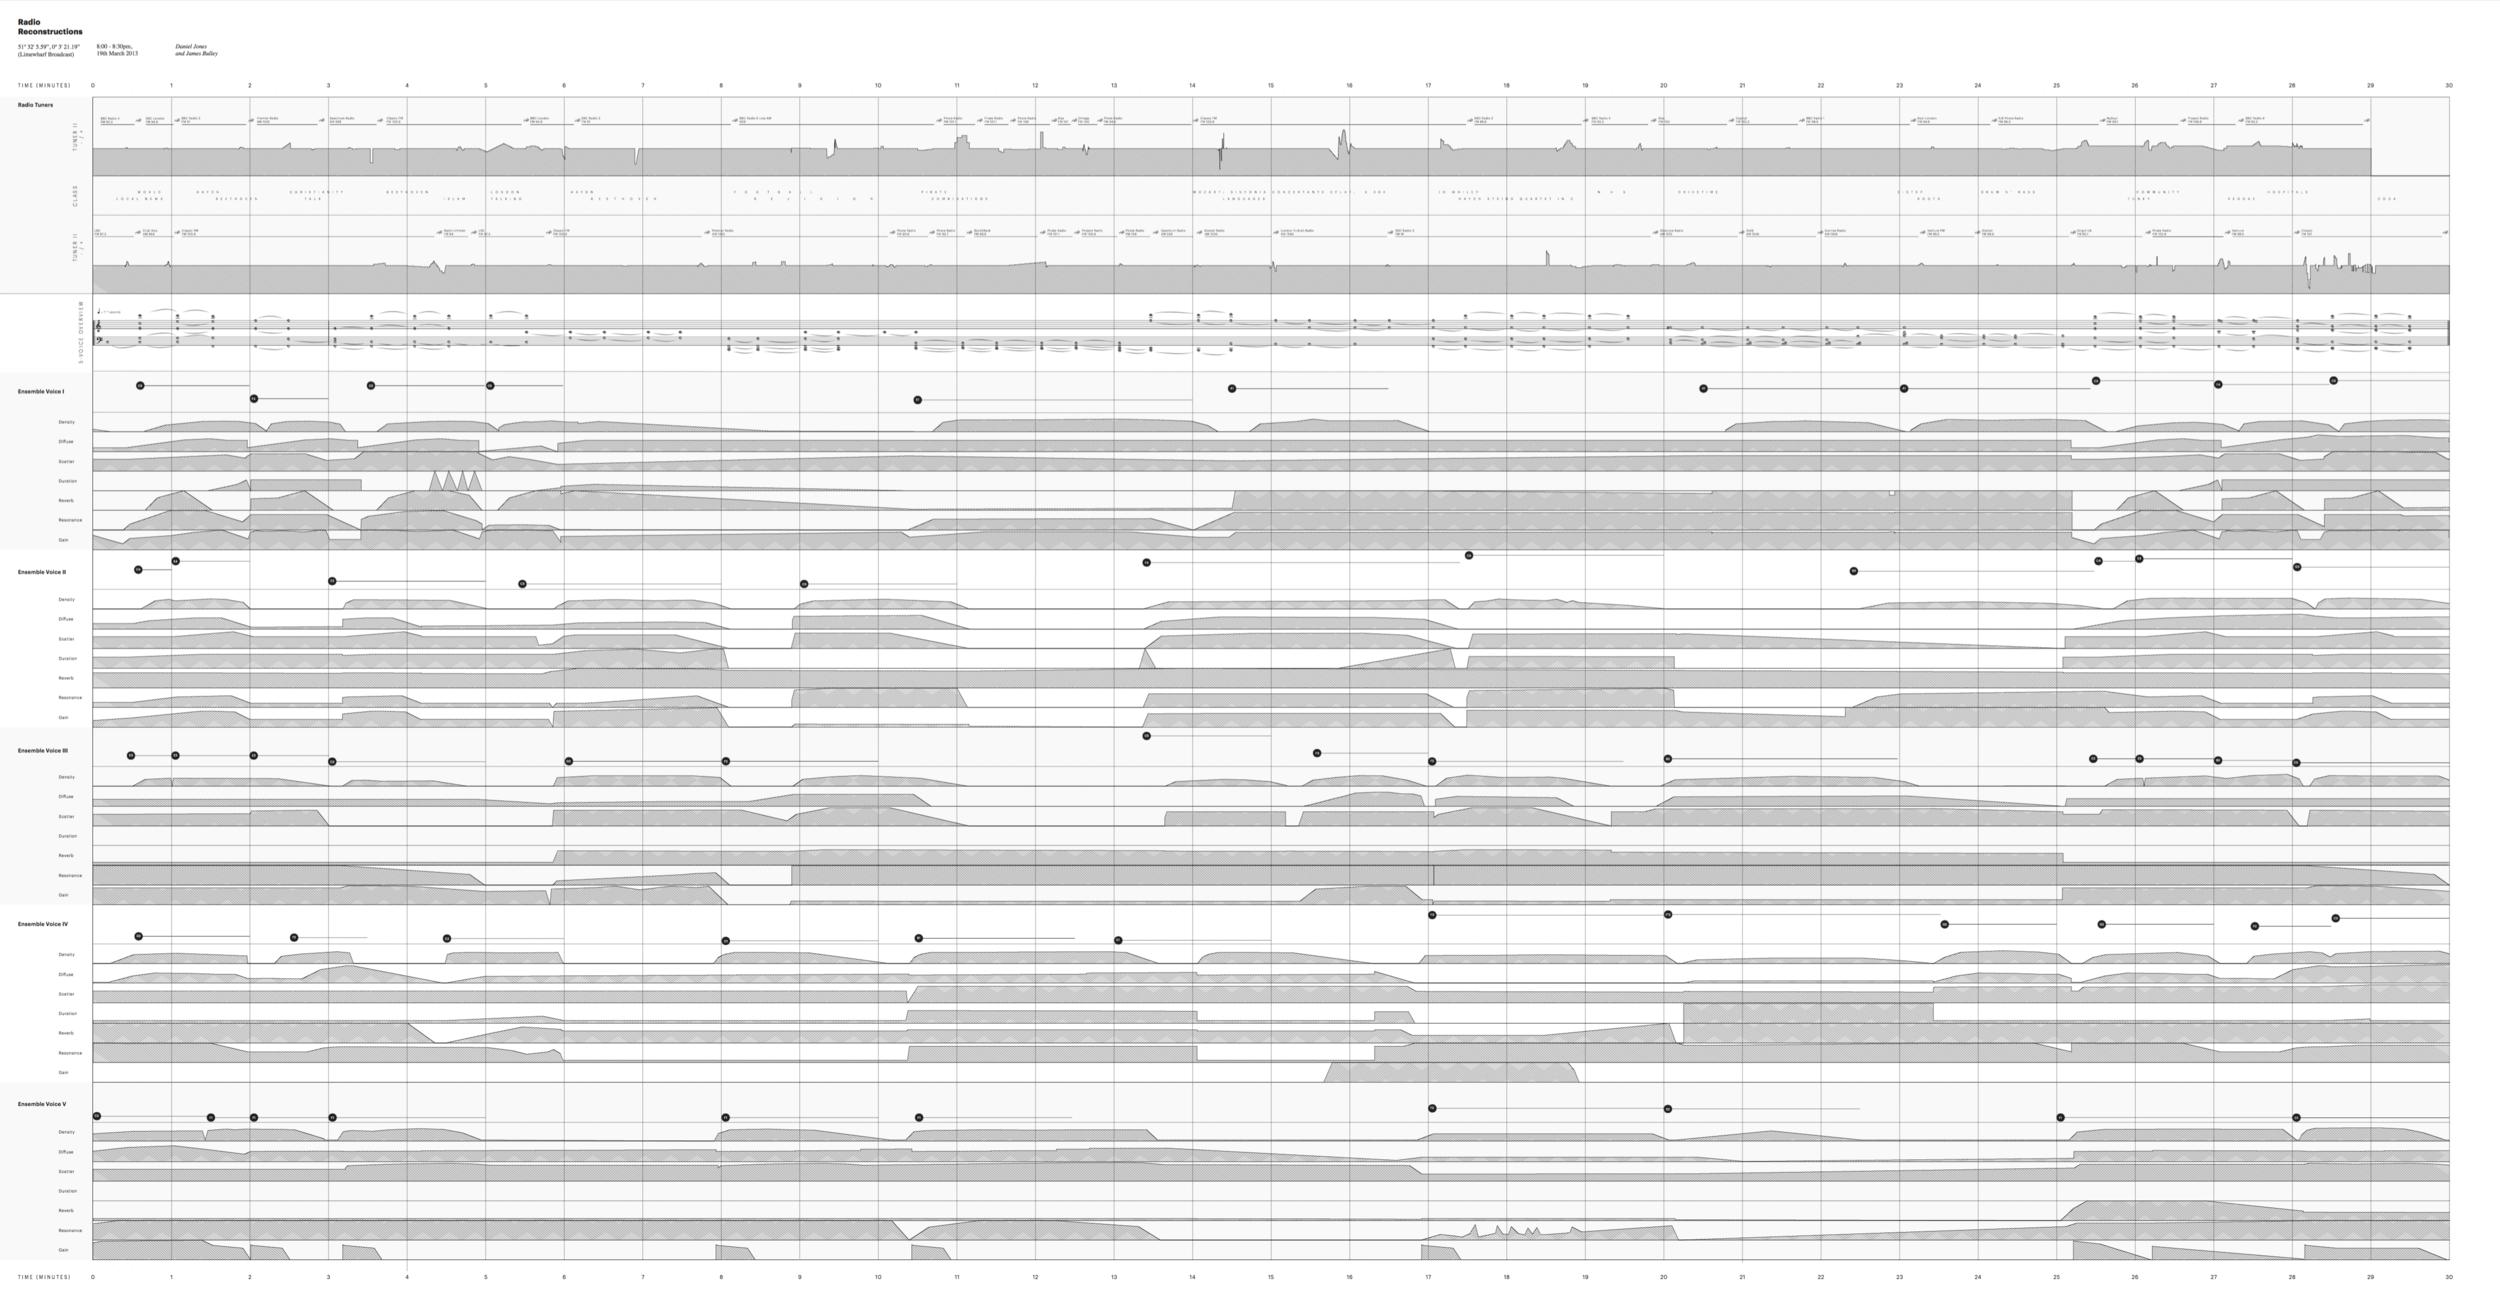 "51 32' 5.59"", 0 3' 21.19"", Limewharf, Radio Reconstructions Score - Jones/Bulley"